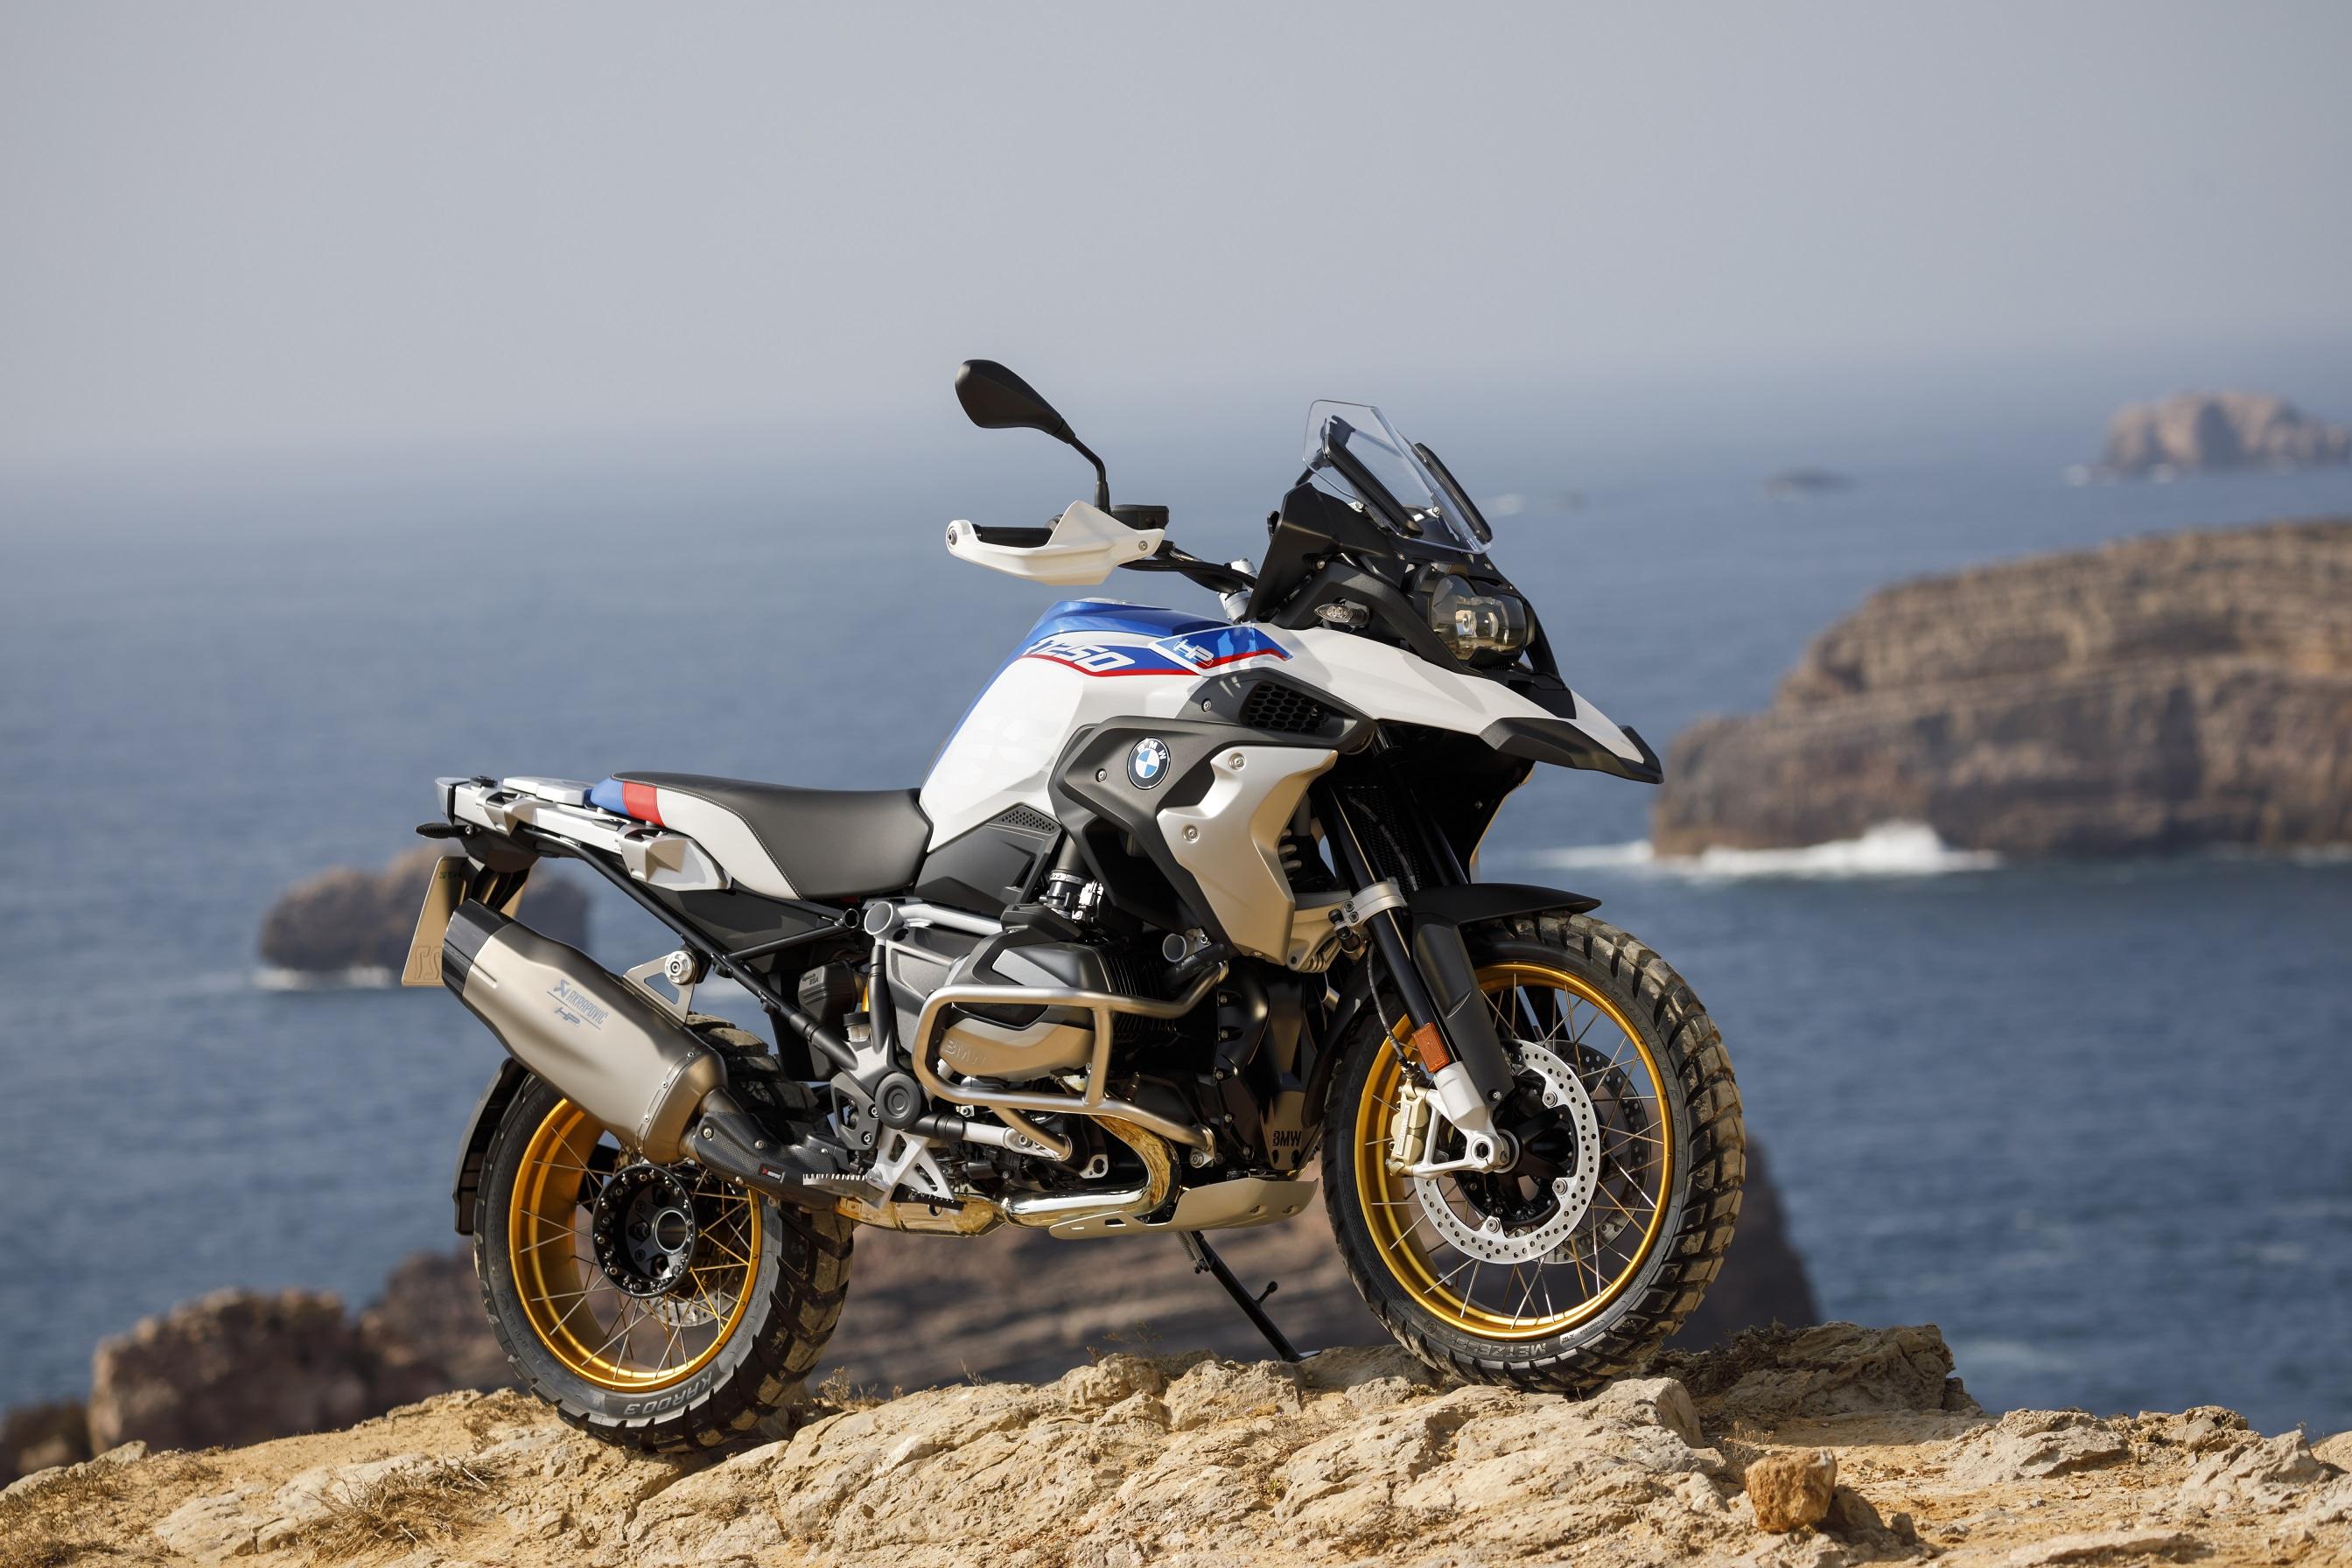 2019 Bmw R 1250 Gs Bmw Motorcycles Of Temecula Temecula Ca